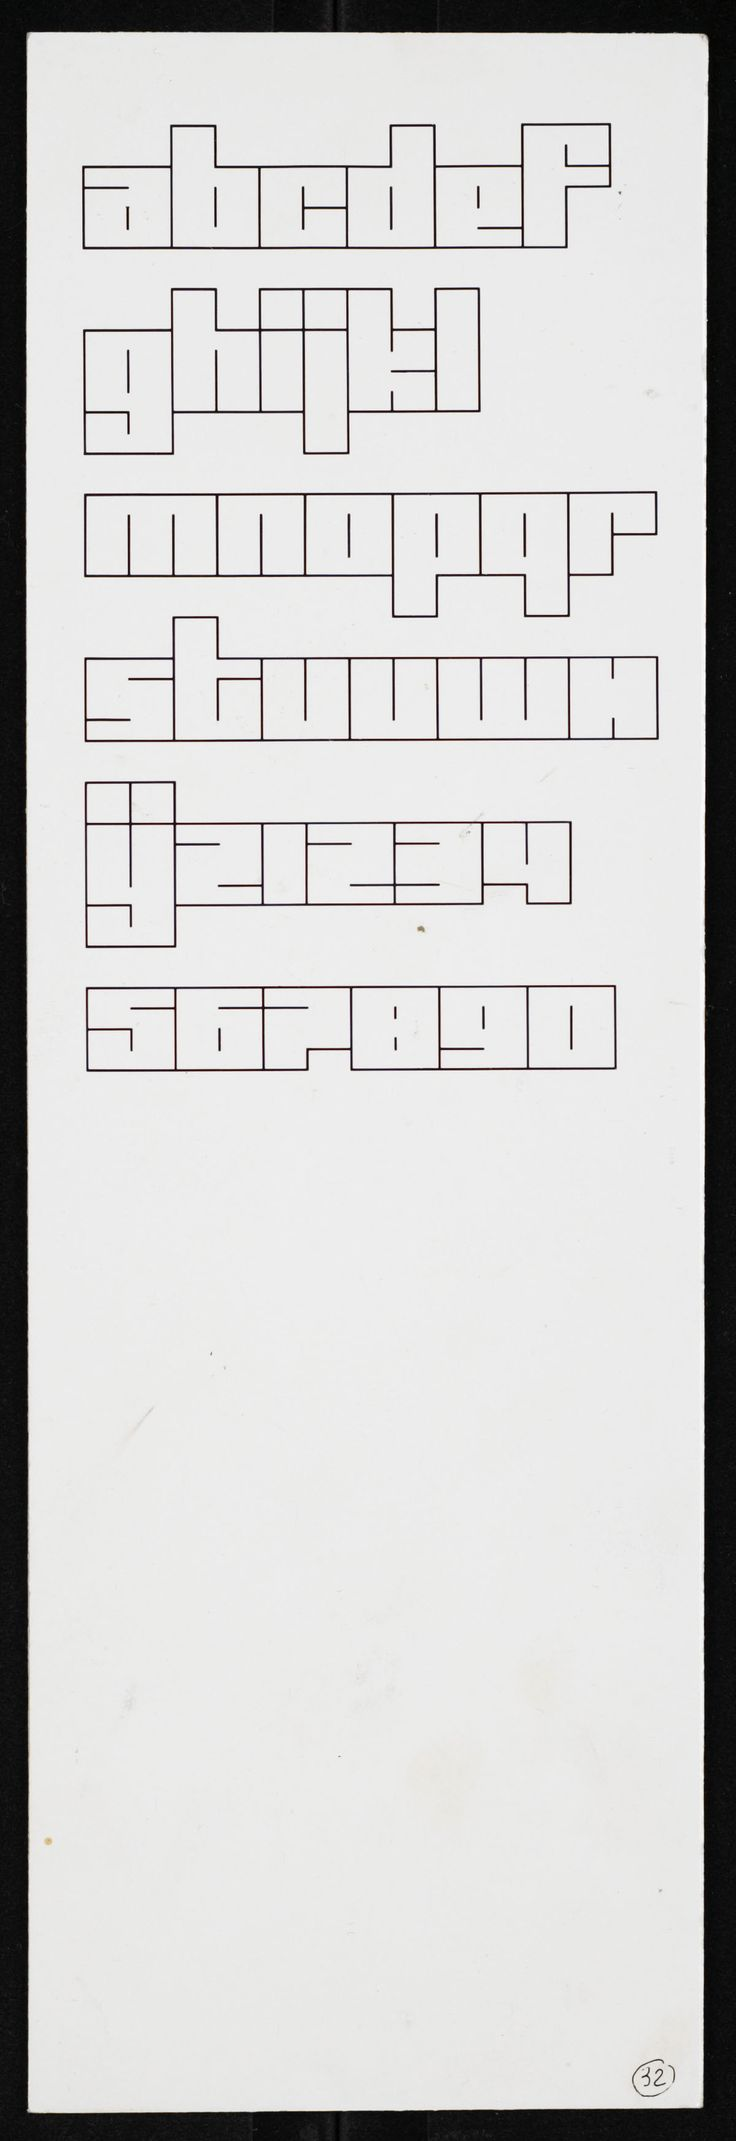 Jurriaan Schrofer - Type Design